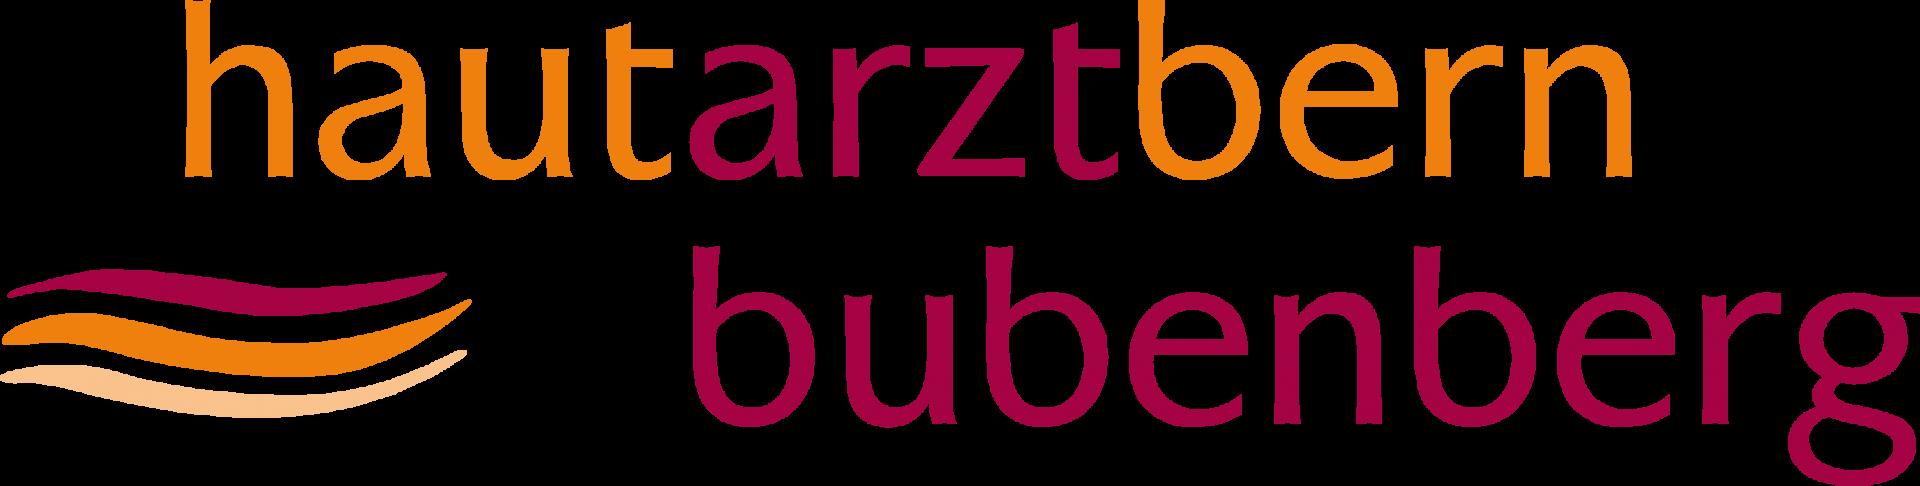 Logo_hautarzt_bern_bubenberg.png